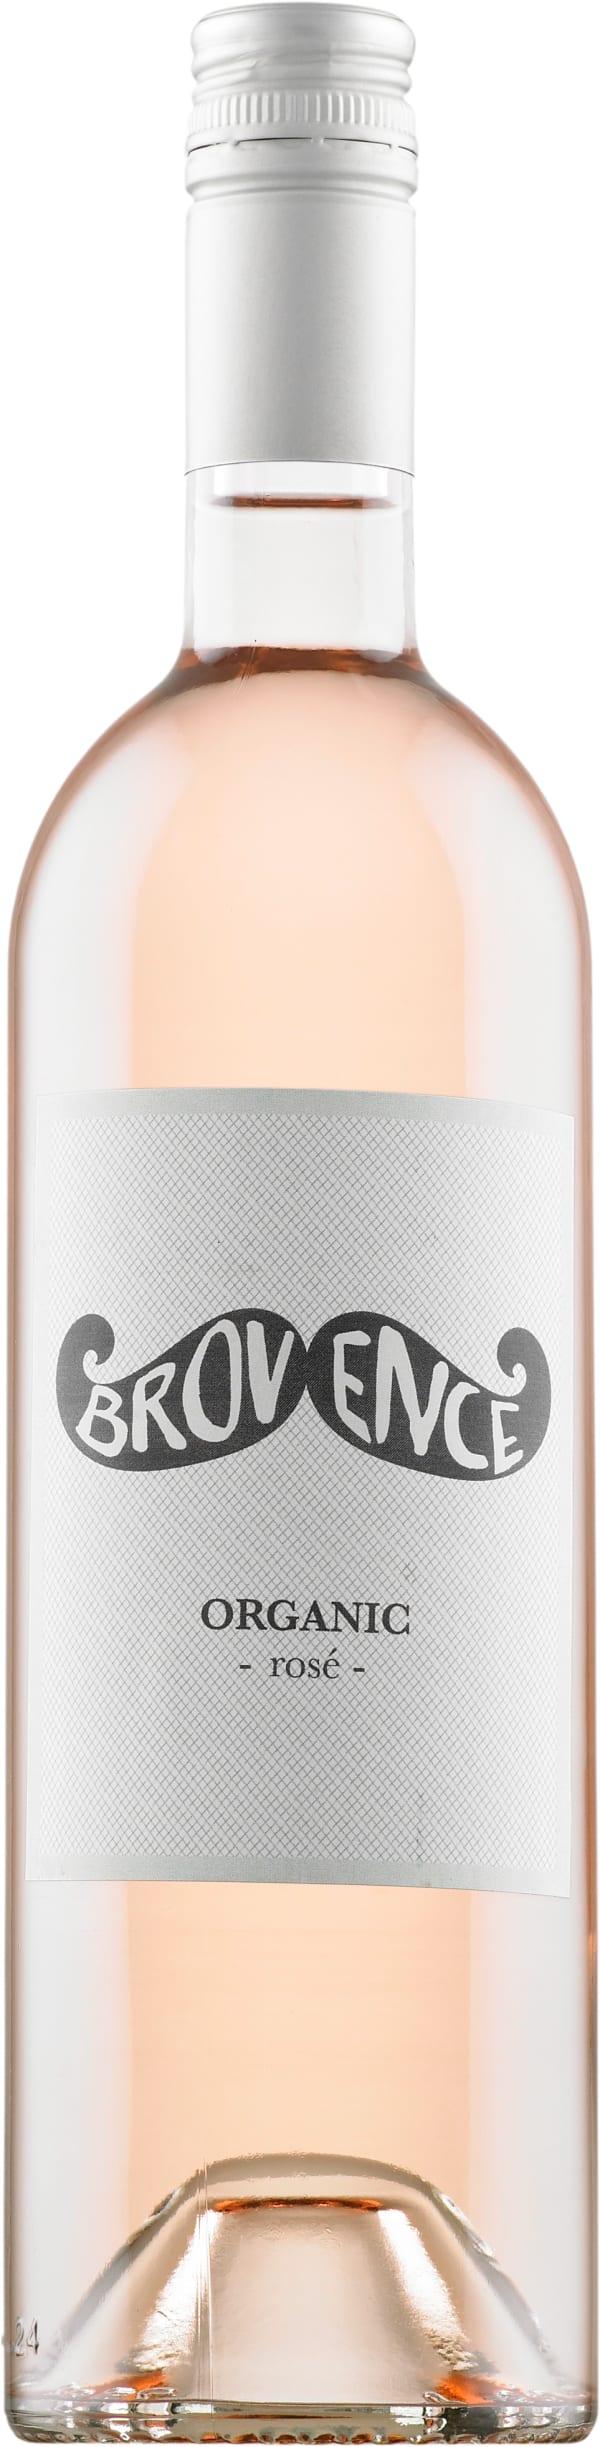 Brovence Organic Rosé 2020